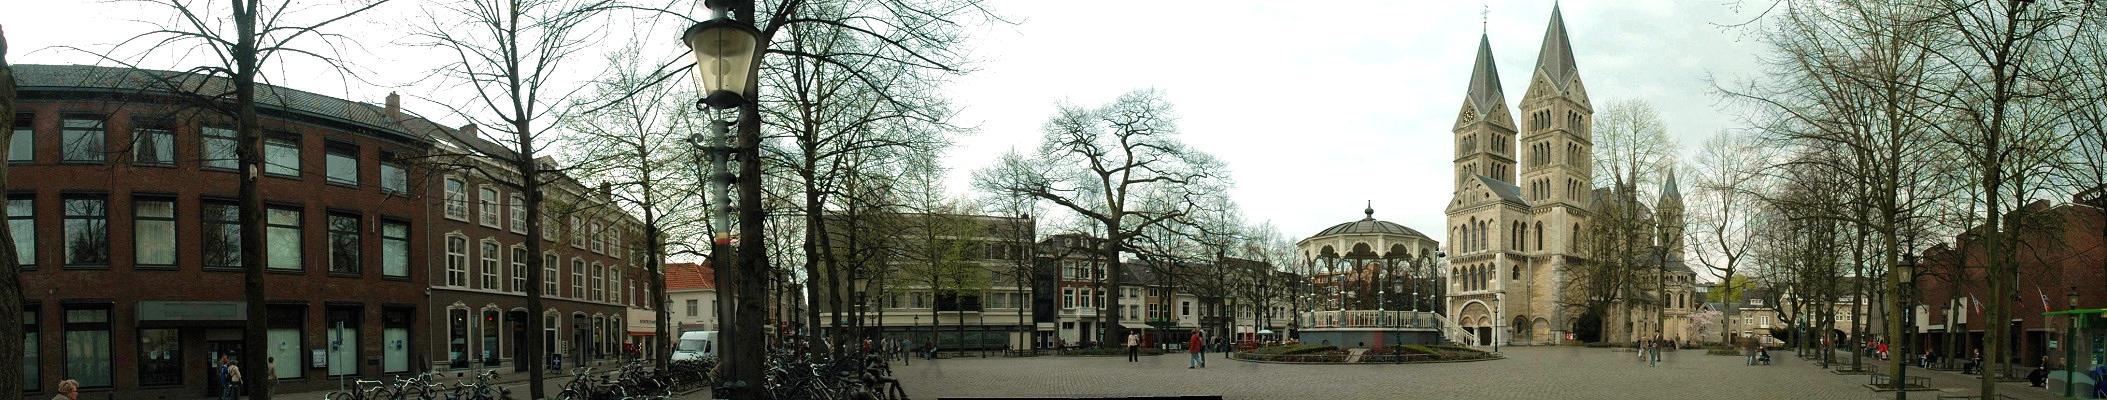 Panoramafoto Munsterplein Roermond